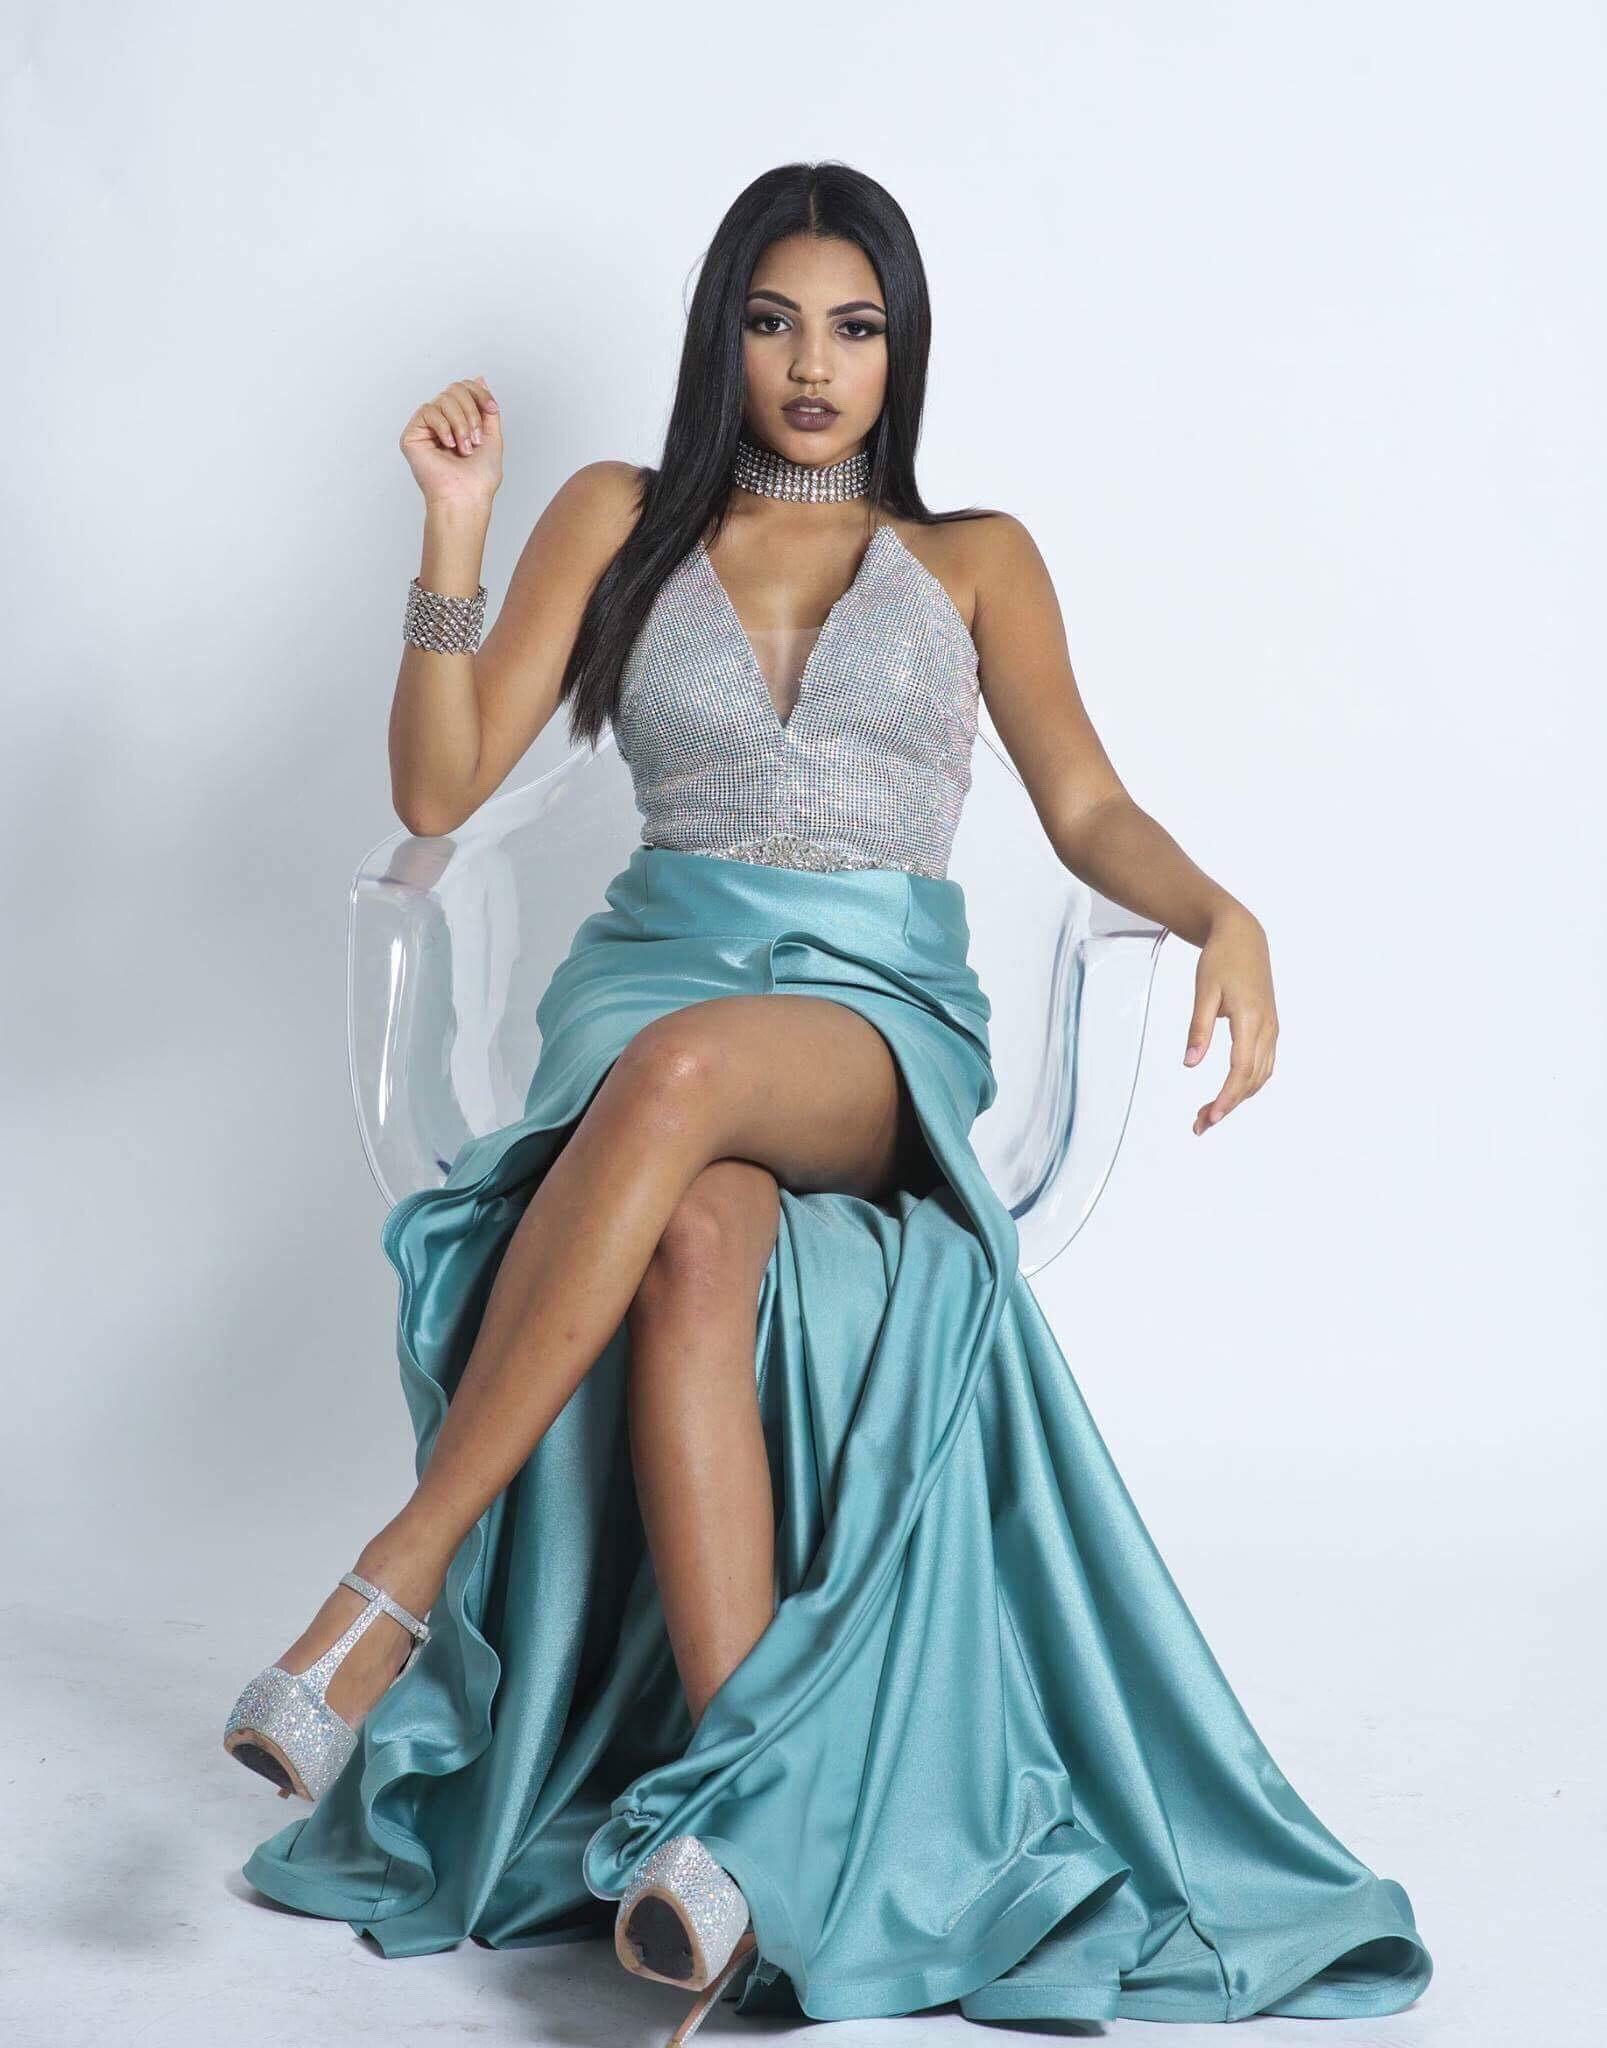 Susan Diaz's Model portfolio